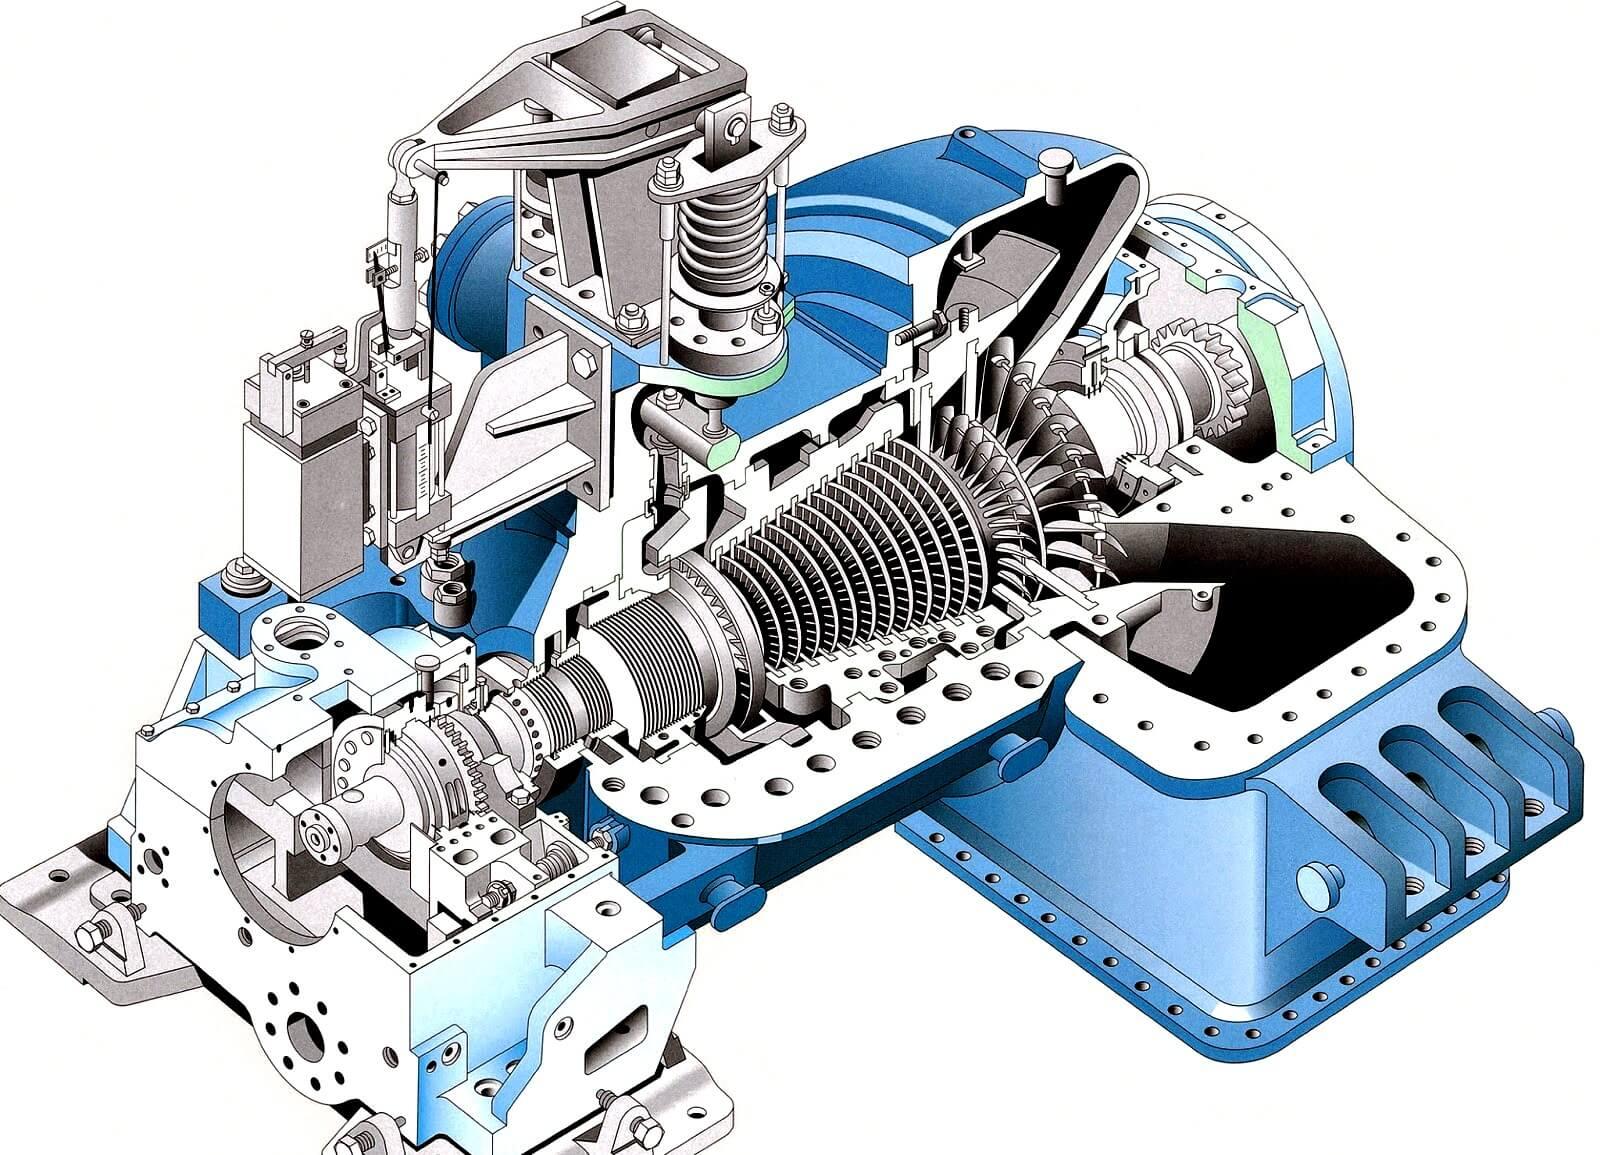 Mesin-mesin Turbo (Turbin Uap)